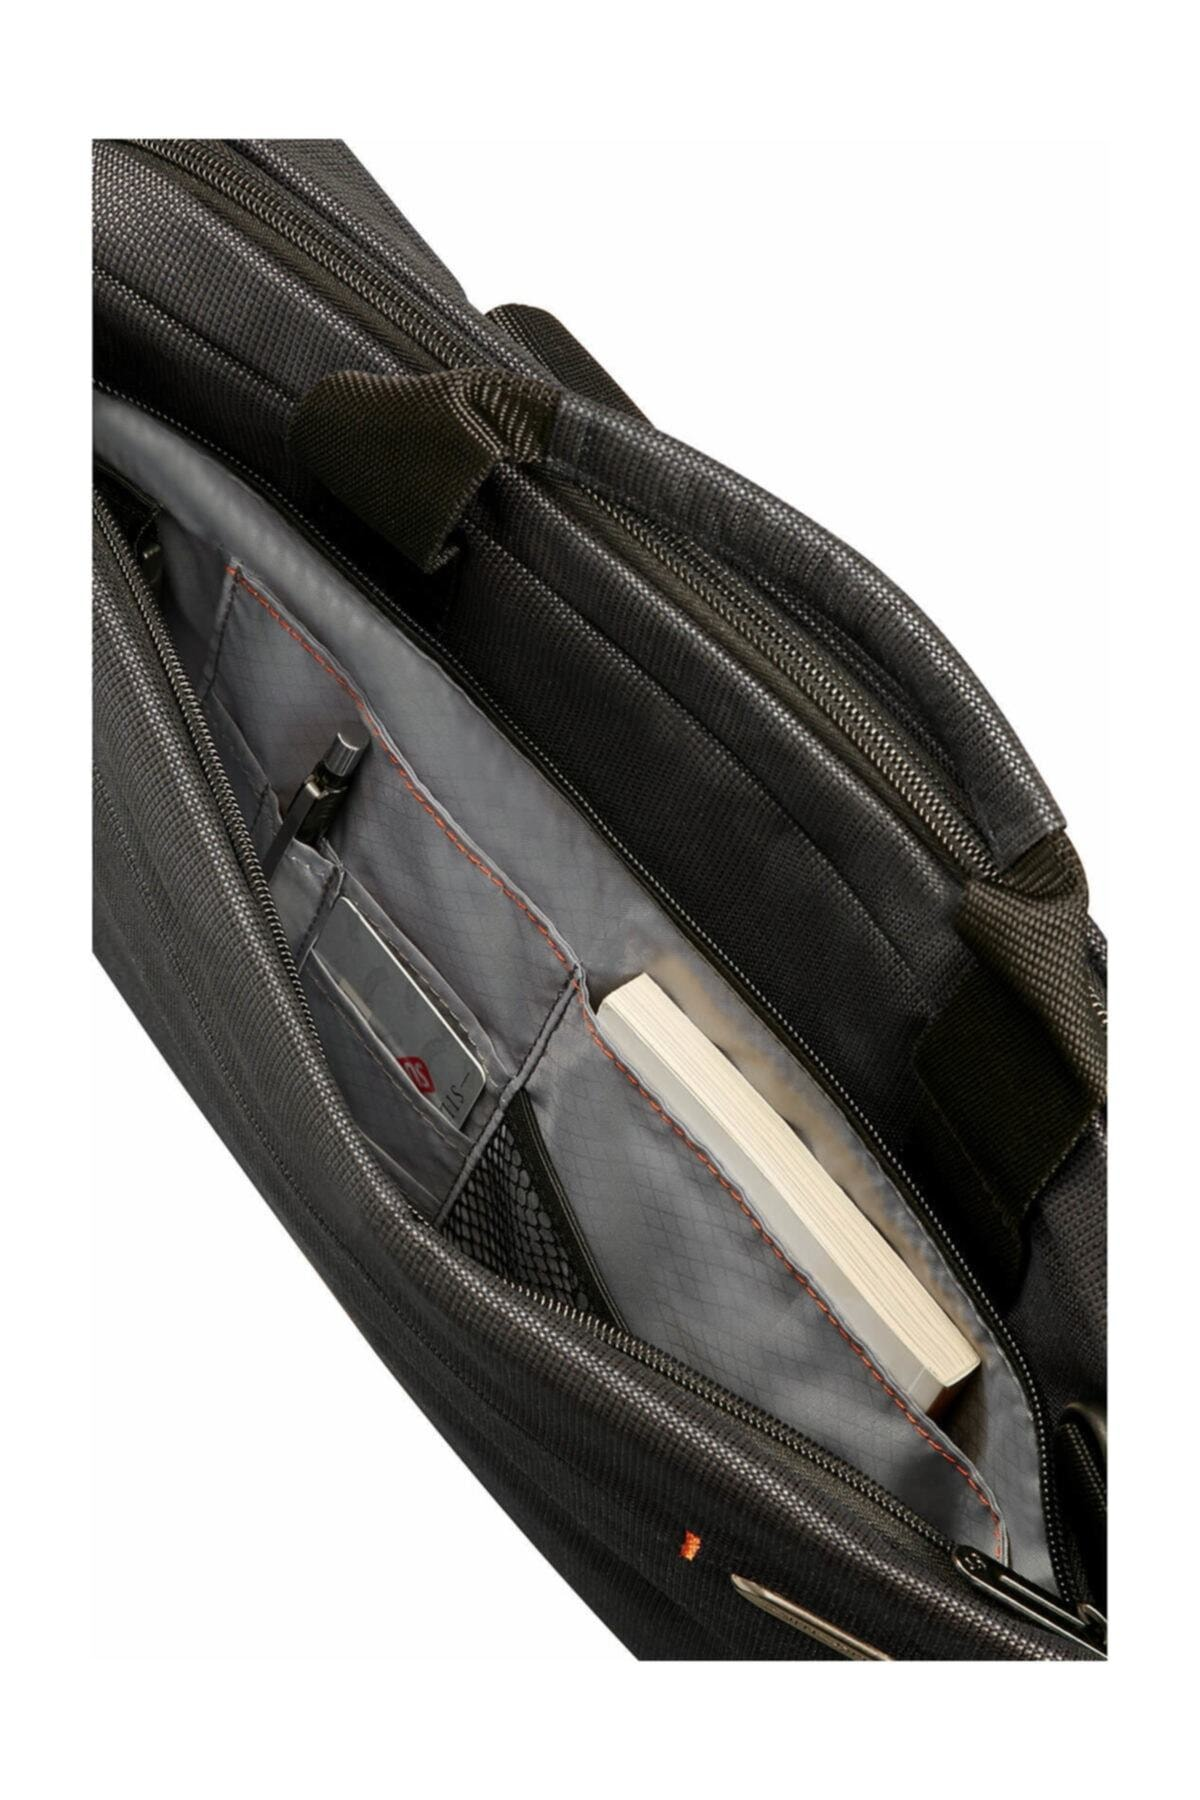 "Samsonite Samsonıte Cc8-19-001 14.1"" Network Notebook Laptop Çantası Siyah 2"